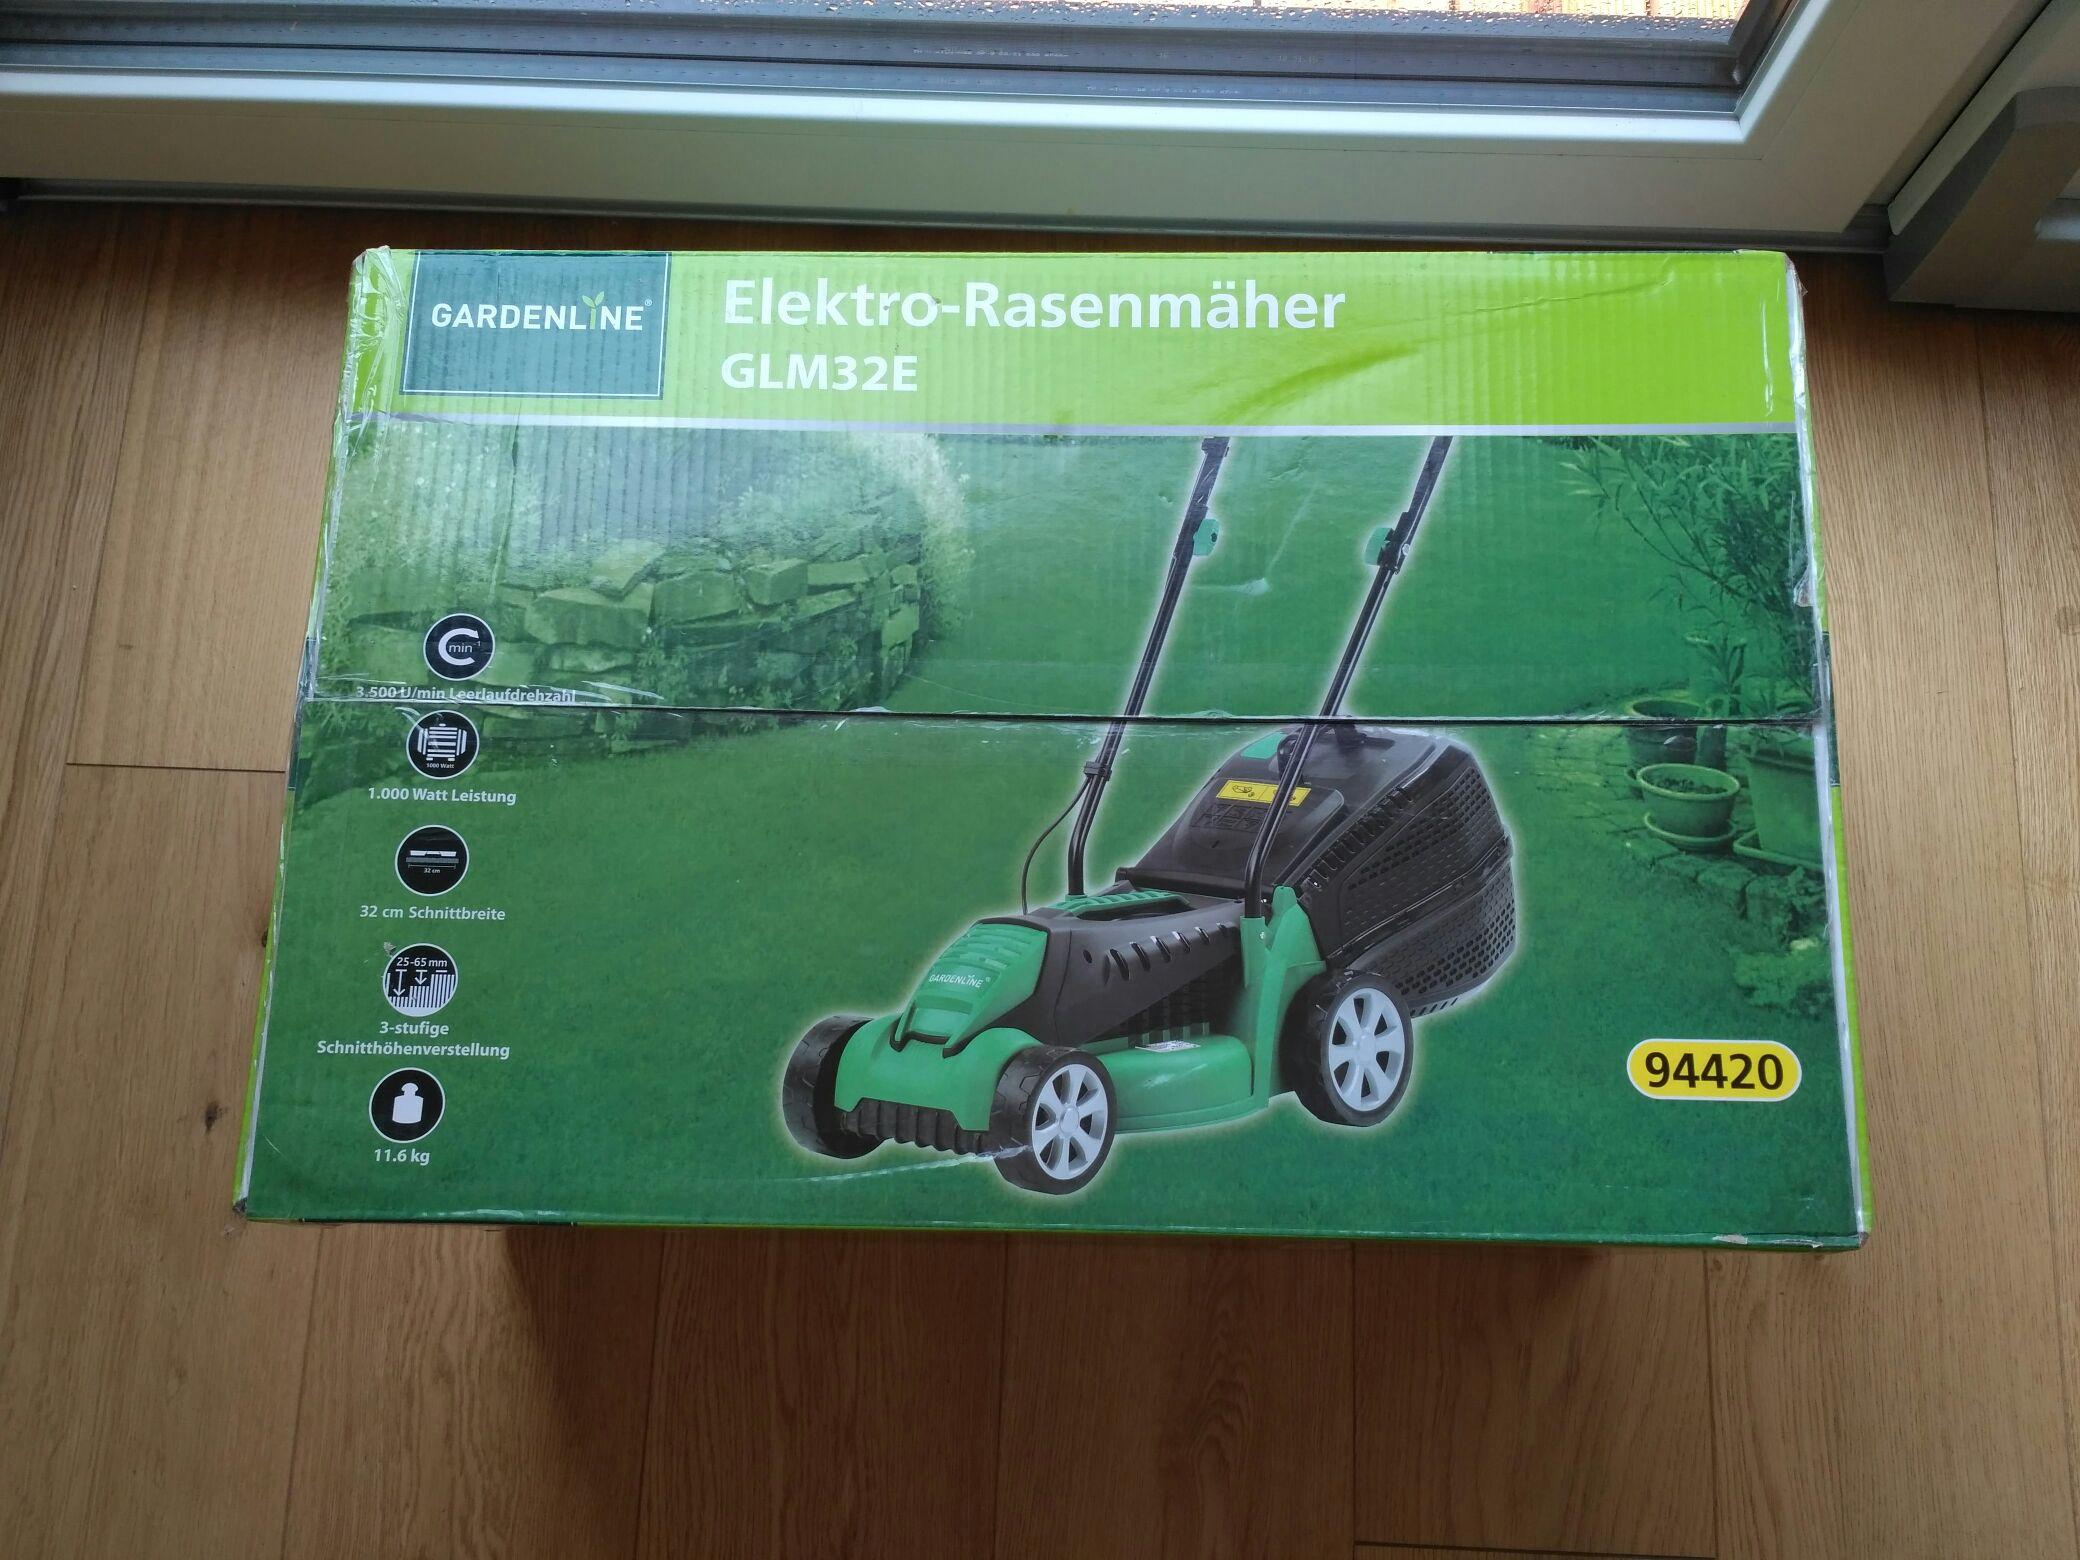 Aldi Süd Elektro-Rasenmäher ab heute reduziert